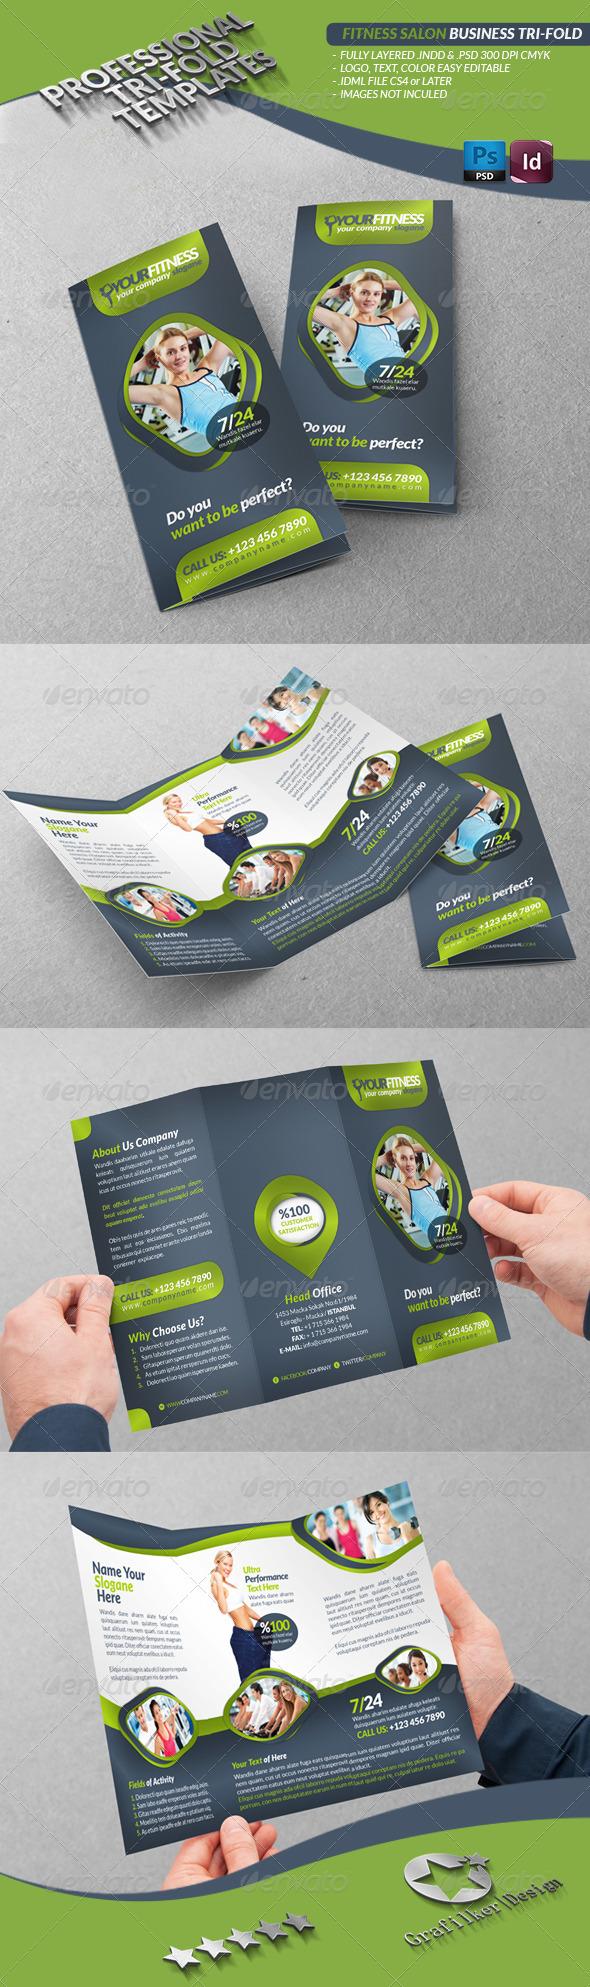 GraphicRiver Fitness Salon Business Tri-Fold 3481146